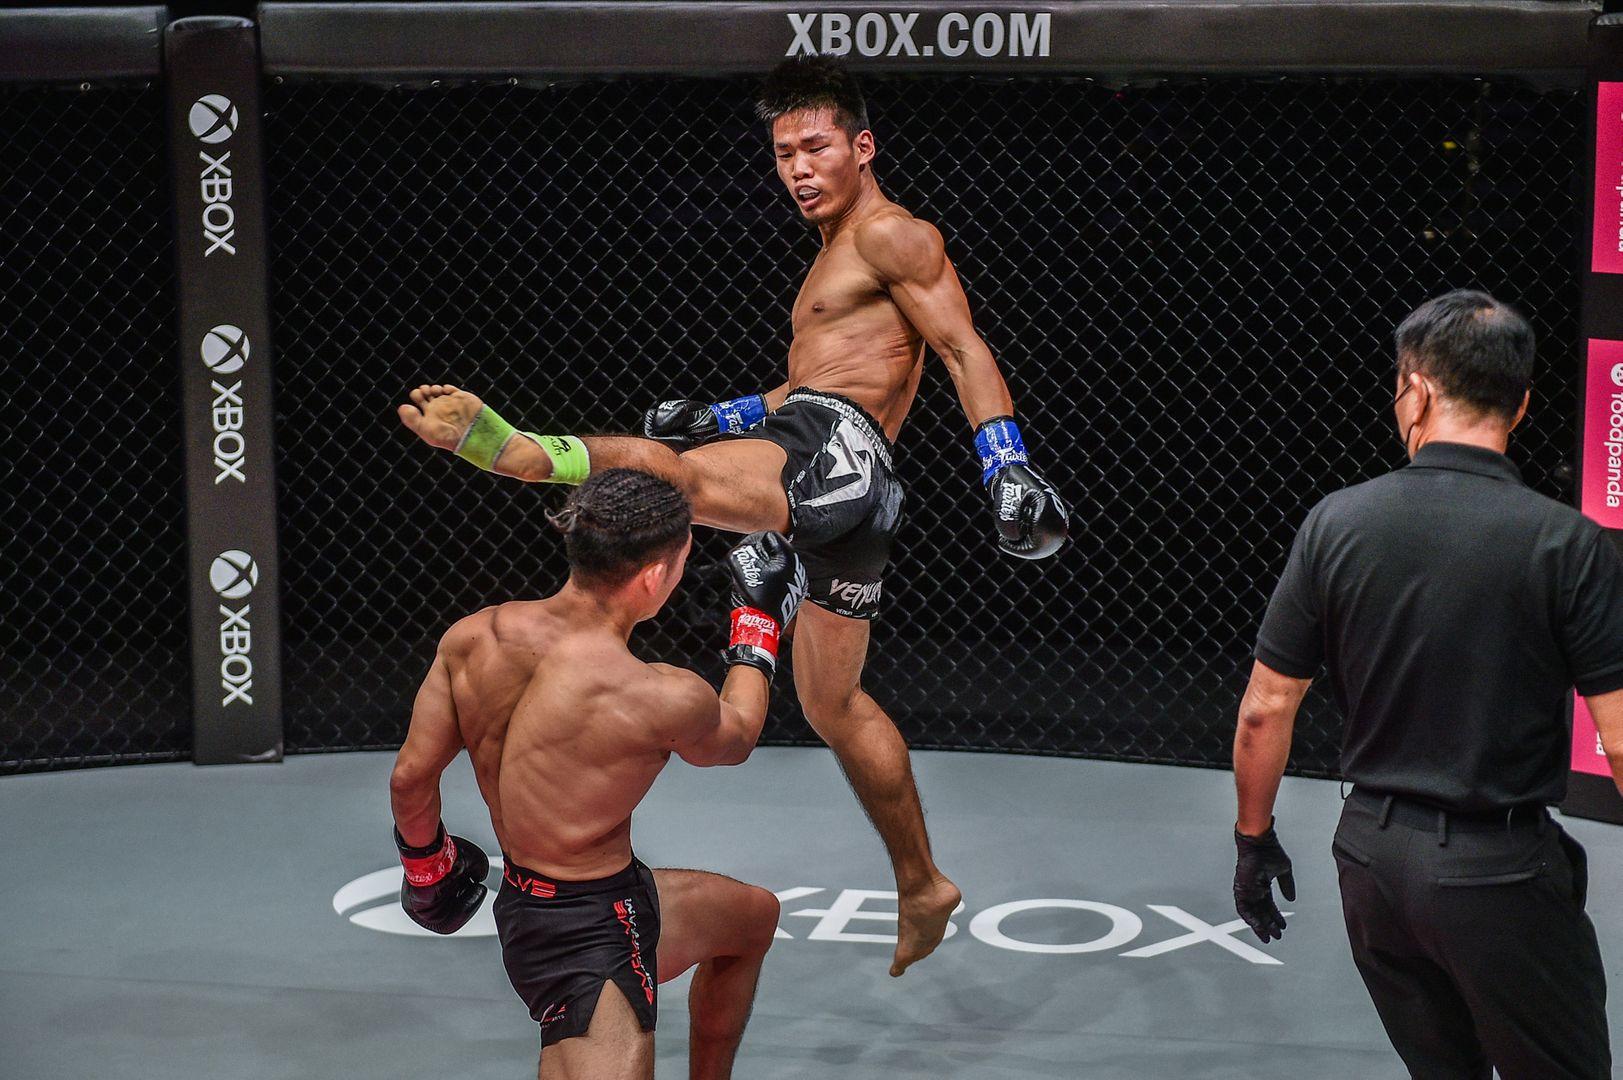 Bantamweight kickboxers Hiroki Akimoto and Zhang Chenglong fight at ONE: REIGN OF DYNASTIES II